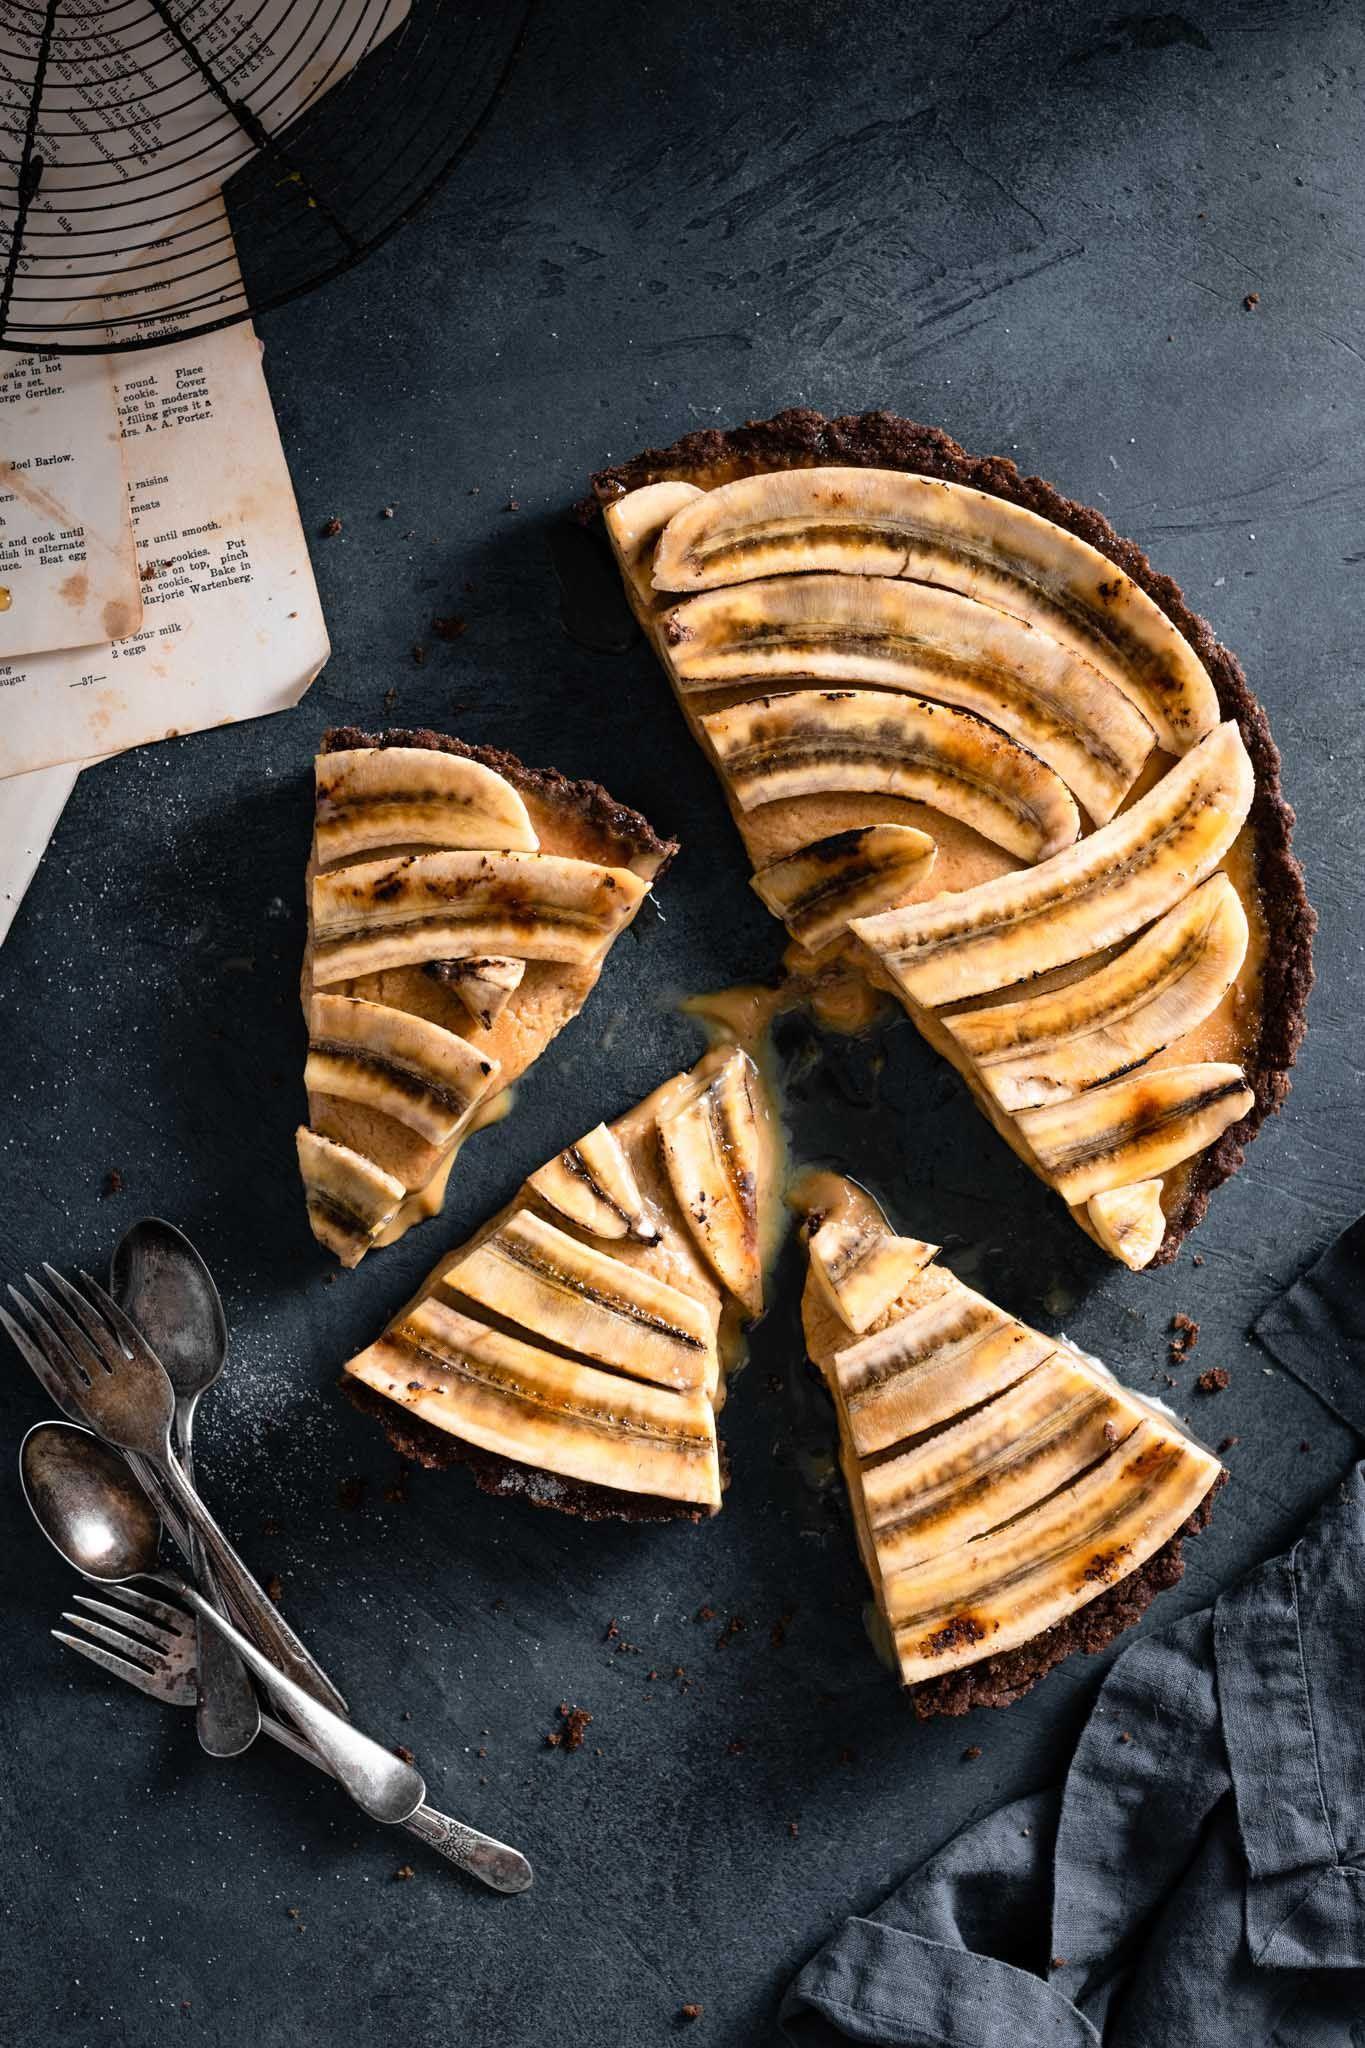 Banana Brulee Tart Cremebrulee Banana Bananatart Bruleebanana Bananadessert Cremebruleerecipe Tart Foodphotography Banana Recipes Food Tart Dessert